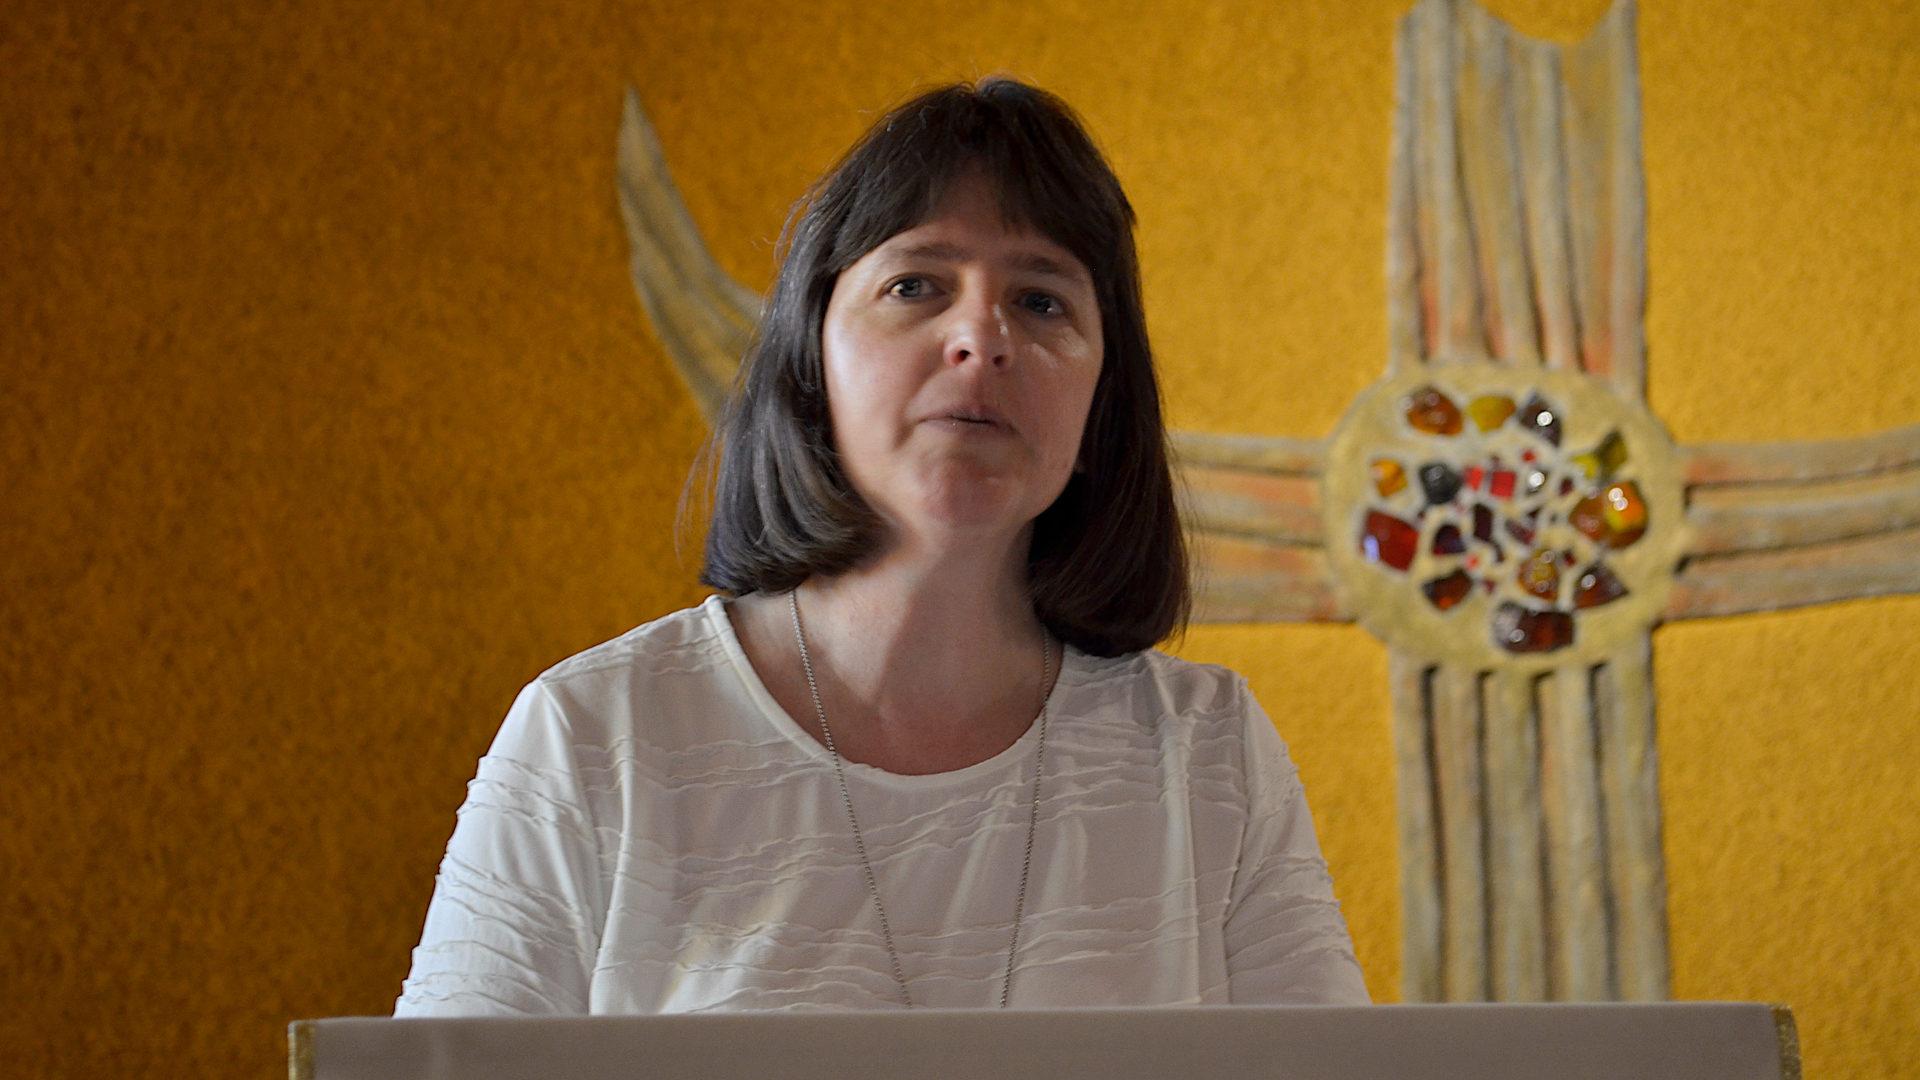 Rosmarie Schärer lektoriert im Seminar-Oratorium | © Regula Pfeifer